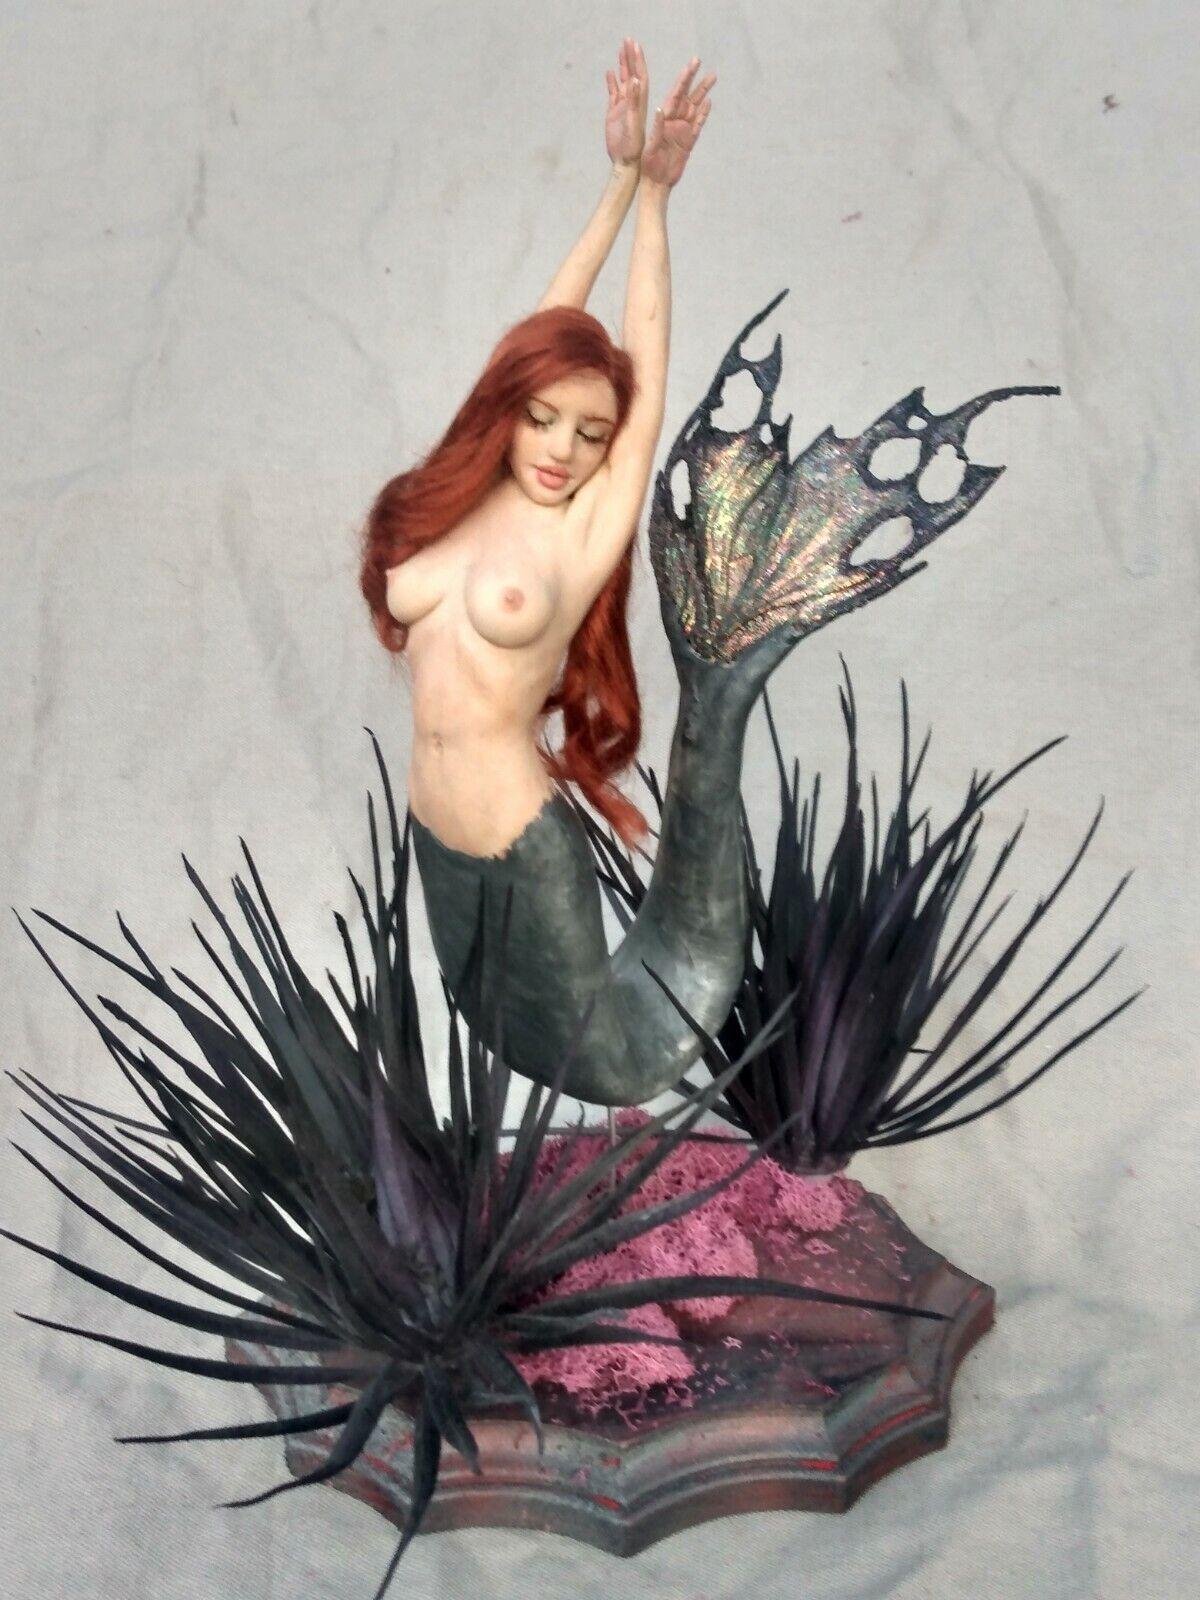 Ooak Fairy Pin-up Mermaid Art Doll Lady Woman Handmade Melissa Drapeau - $500.00